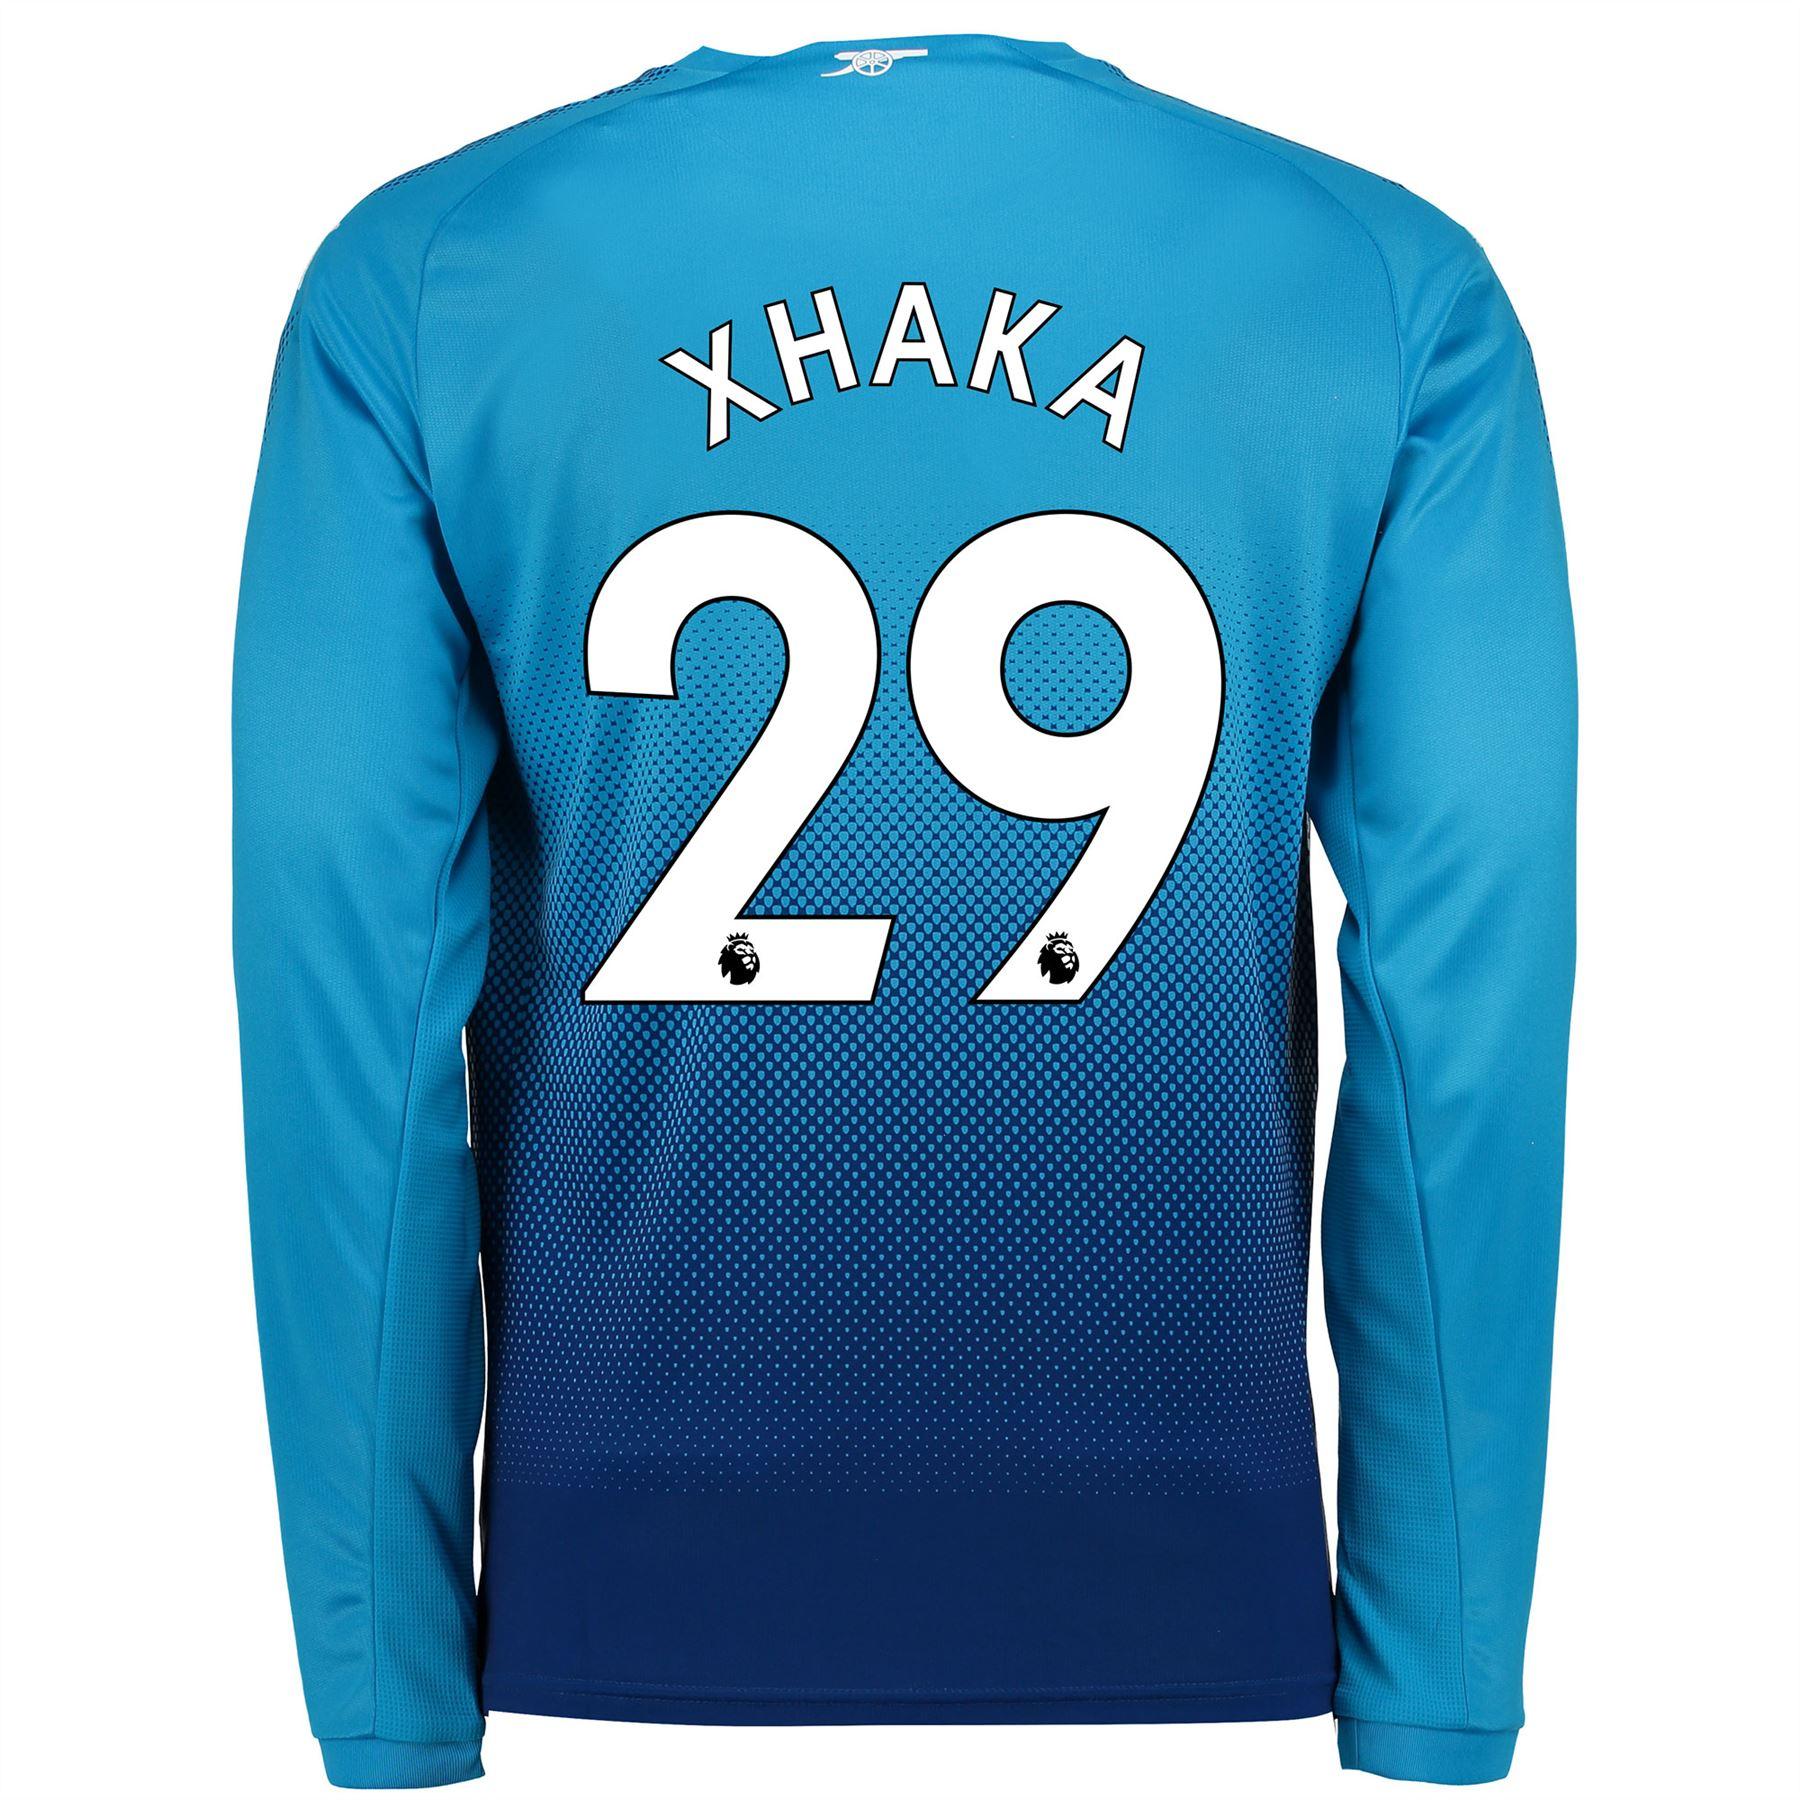 Arsenal-Futbol-Away-Camiseta-2017-18-Manga-Larga-Hombre-Puma